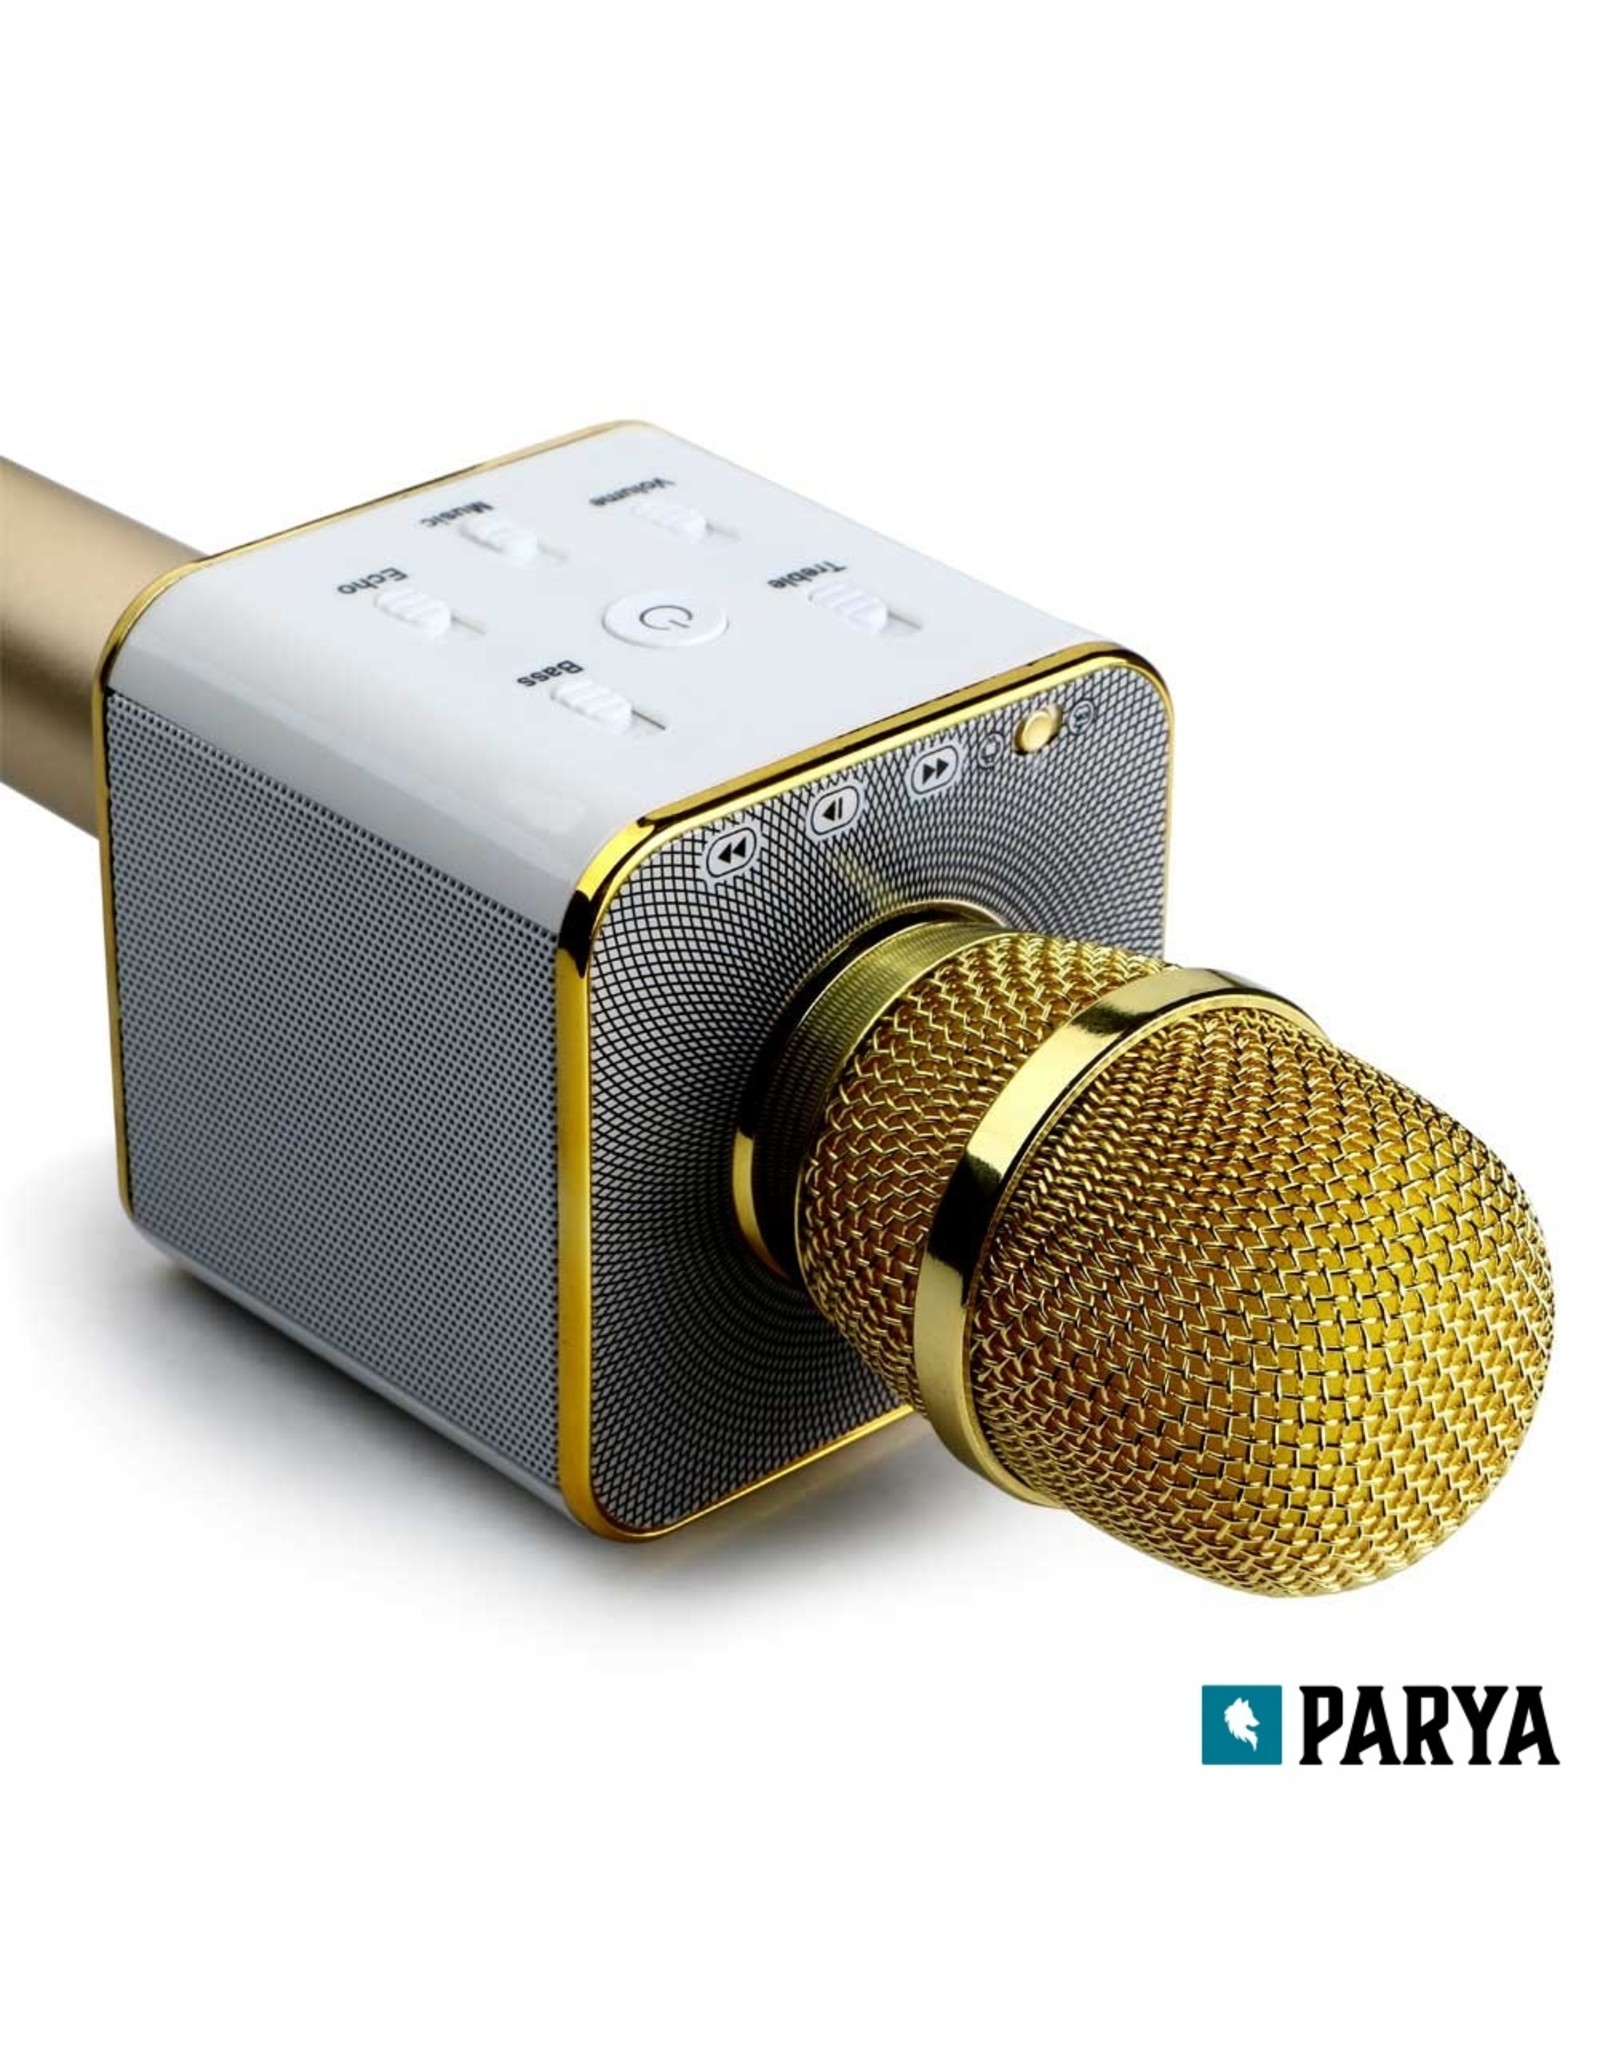 Parya Official Parya Karaoke Microphone